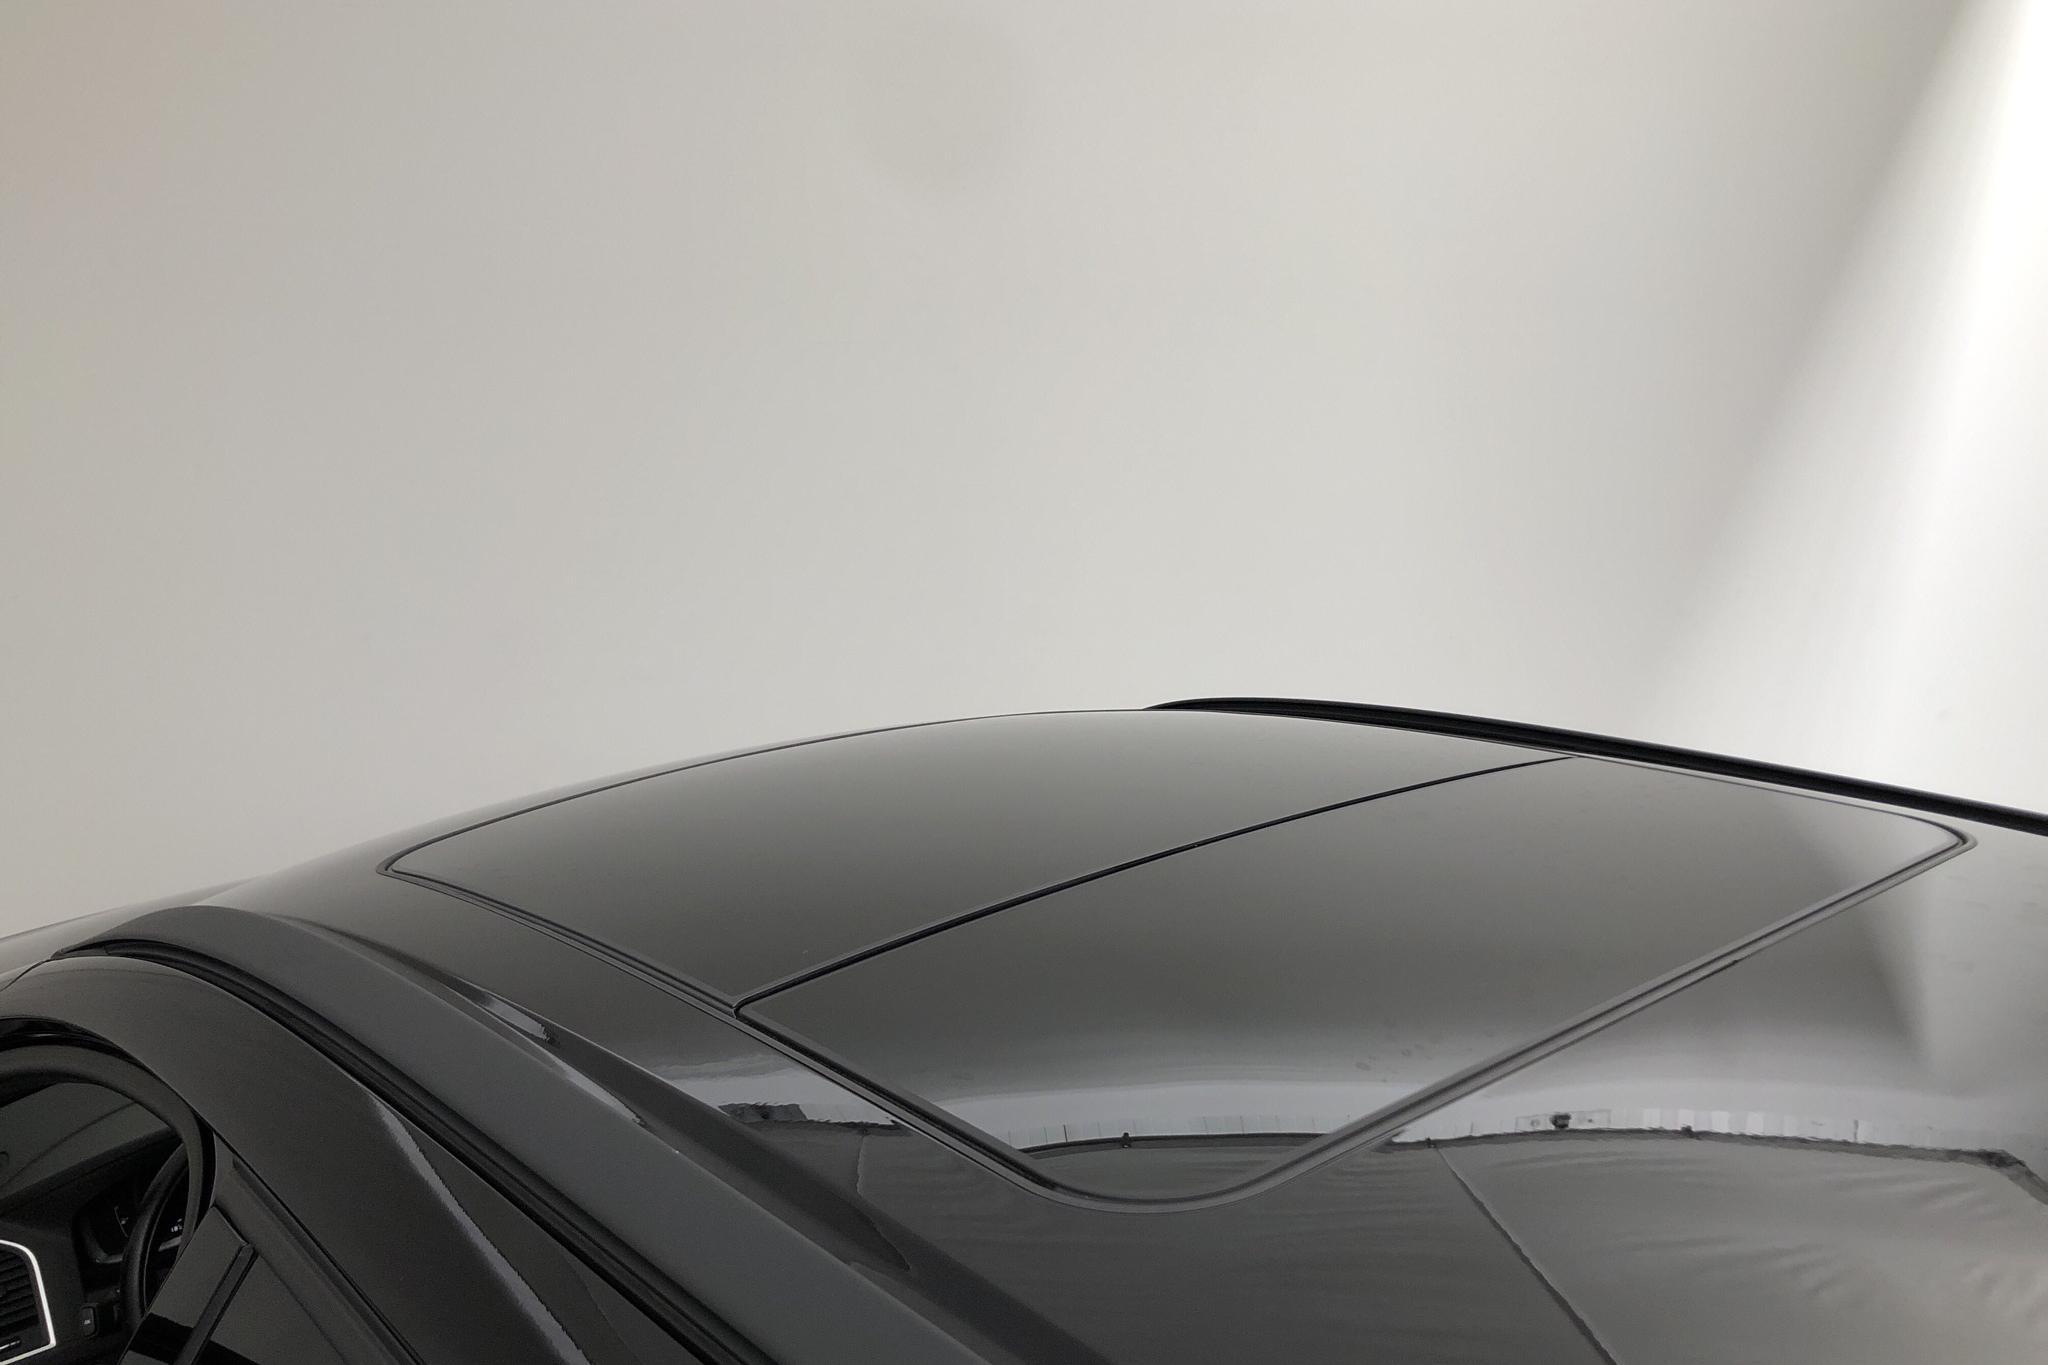 Volvo XC60 D4 AWD (190hk) - 77 780 km - Automatic - black - 2017